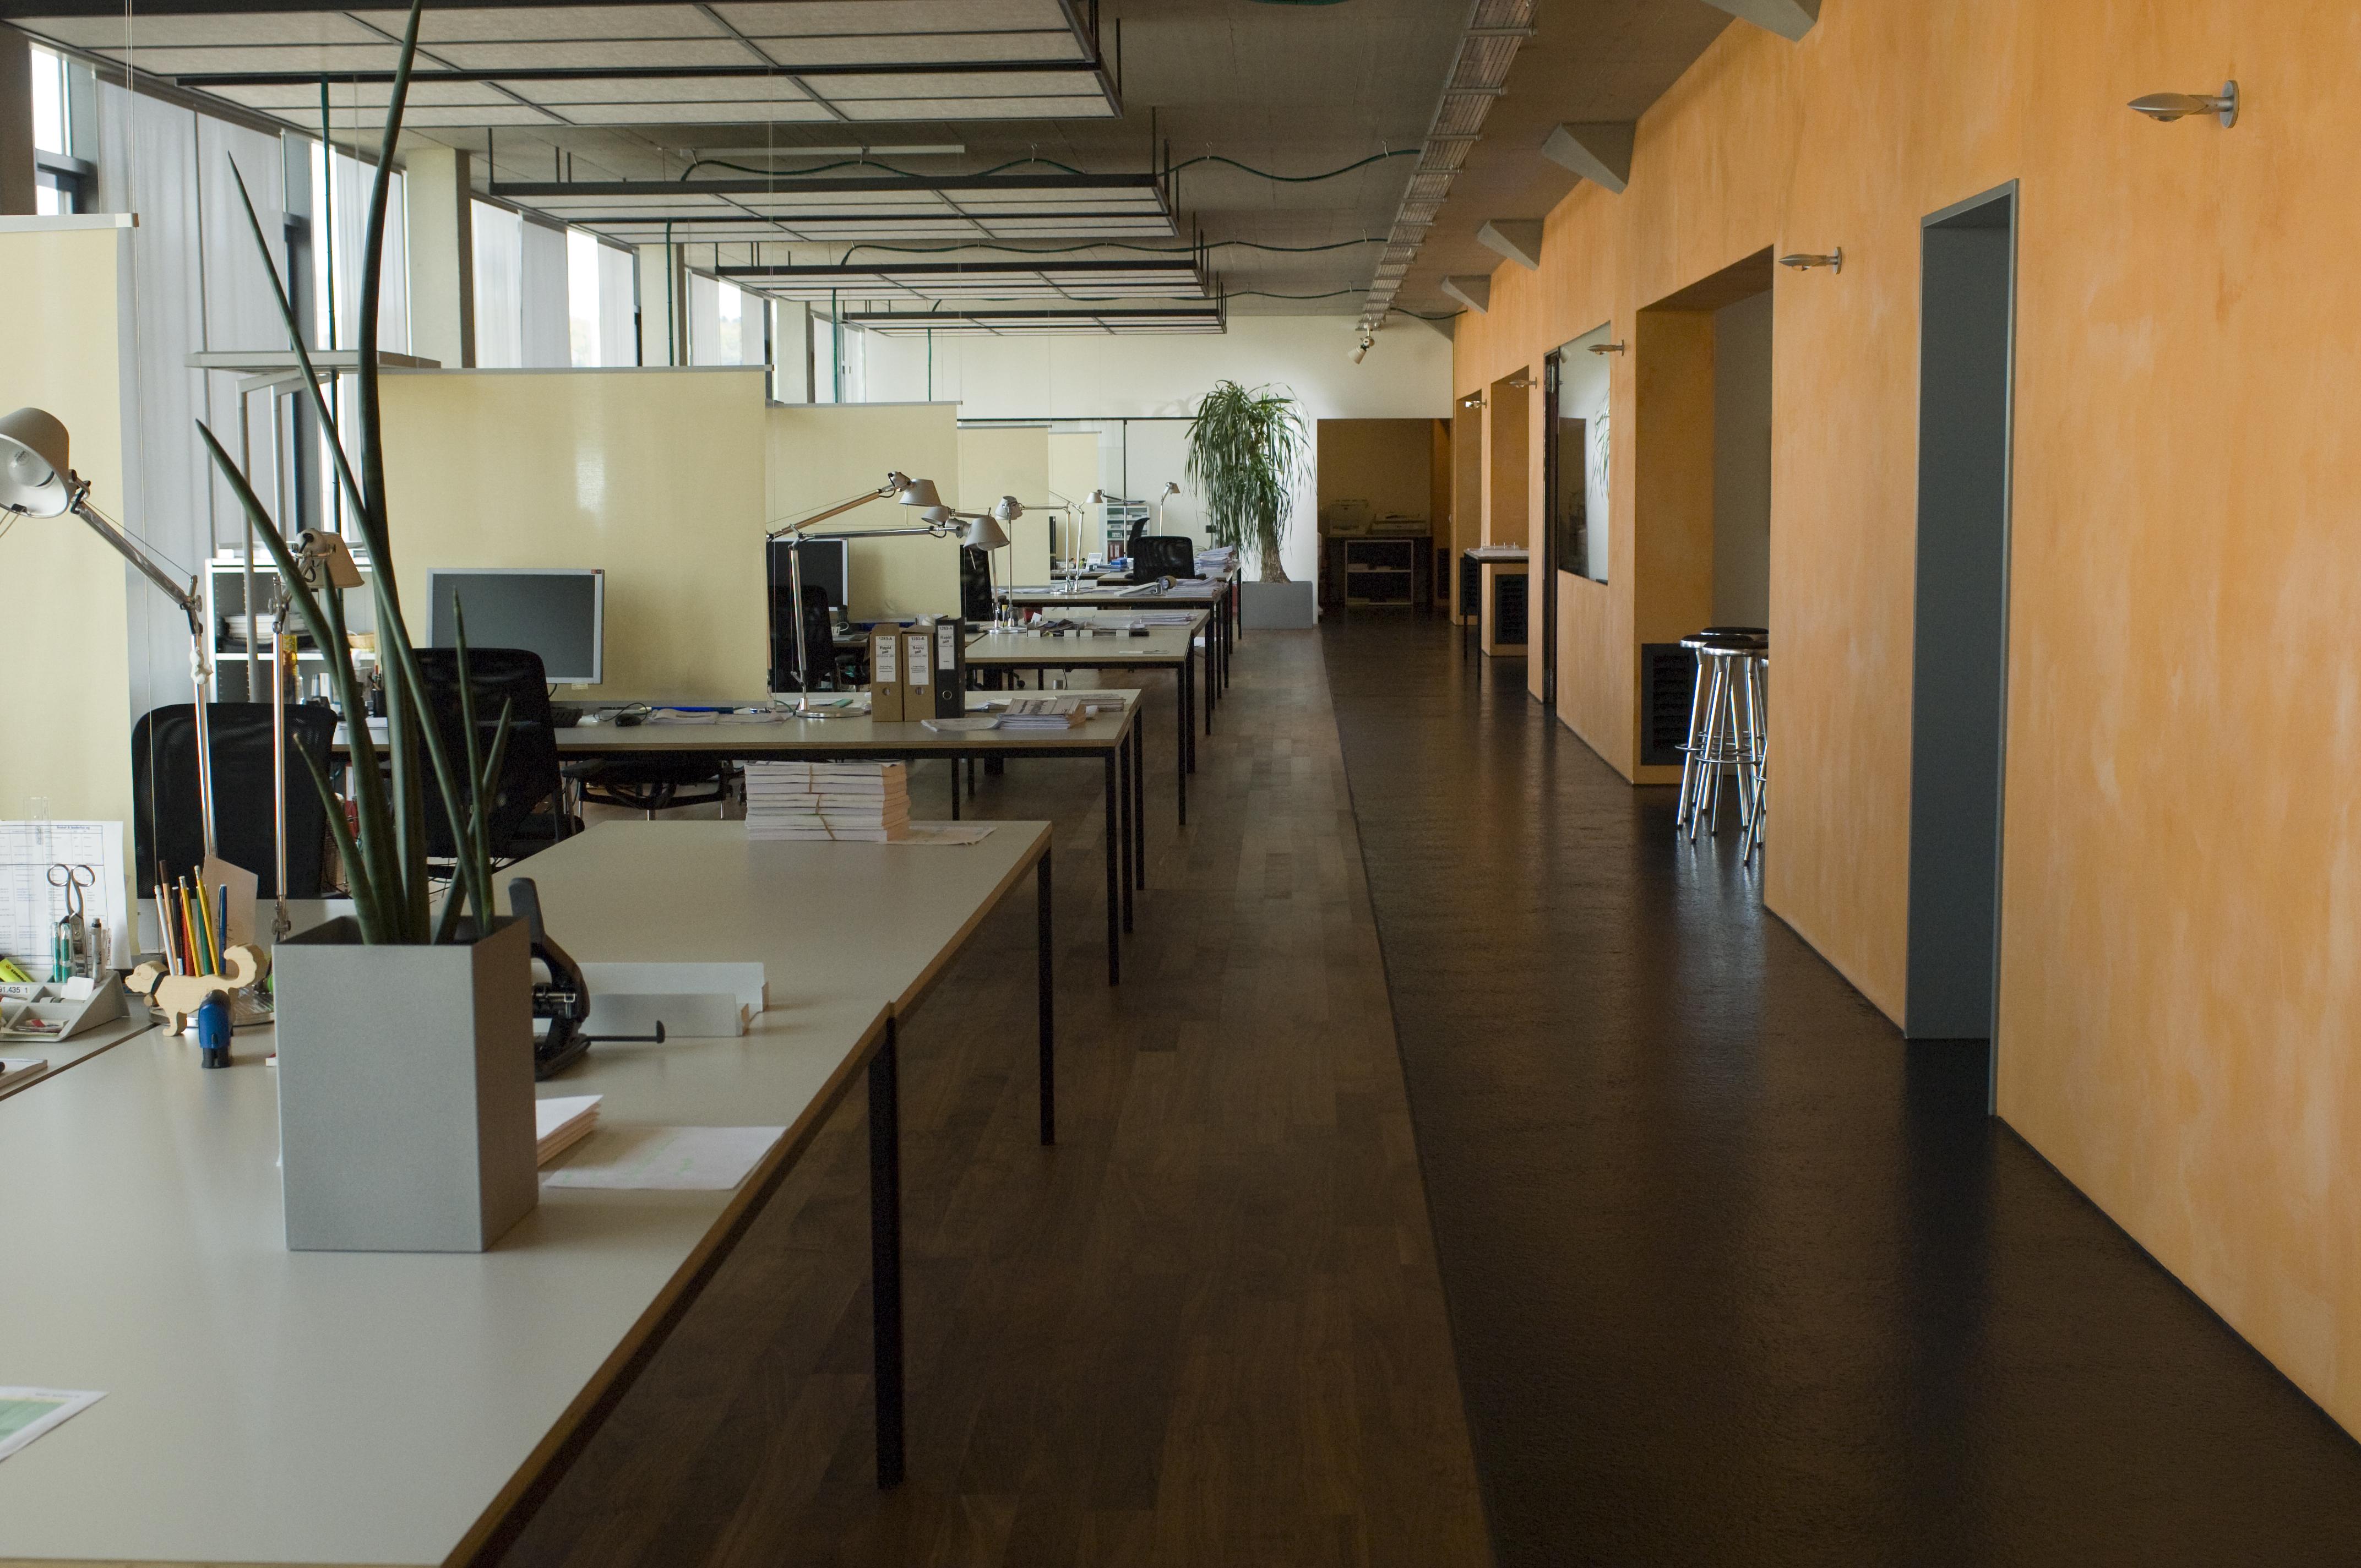 services steda reinigungs service. Black Bedroom Furniture Sets. Home Design Ideas